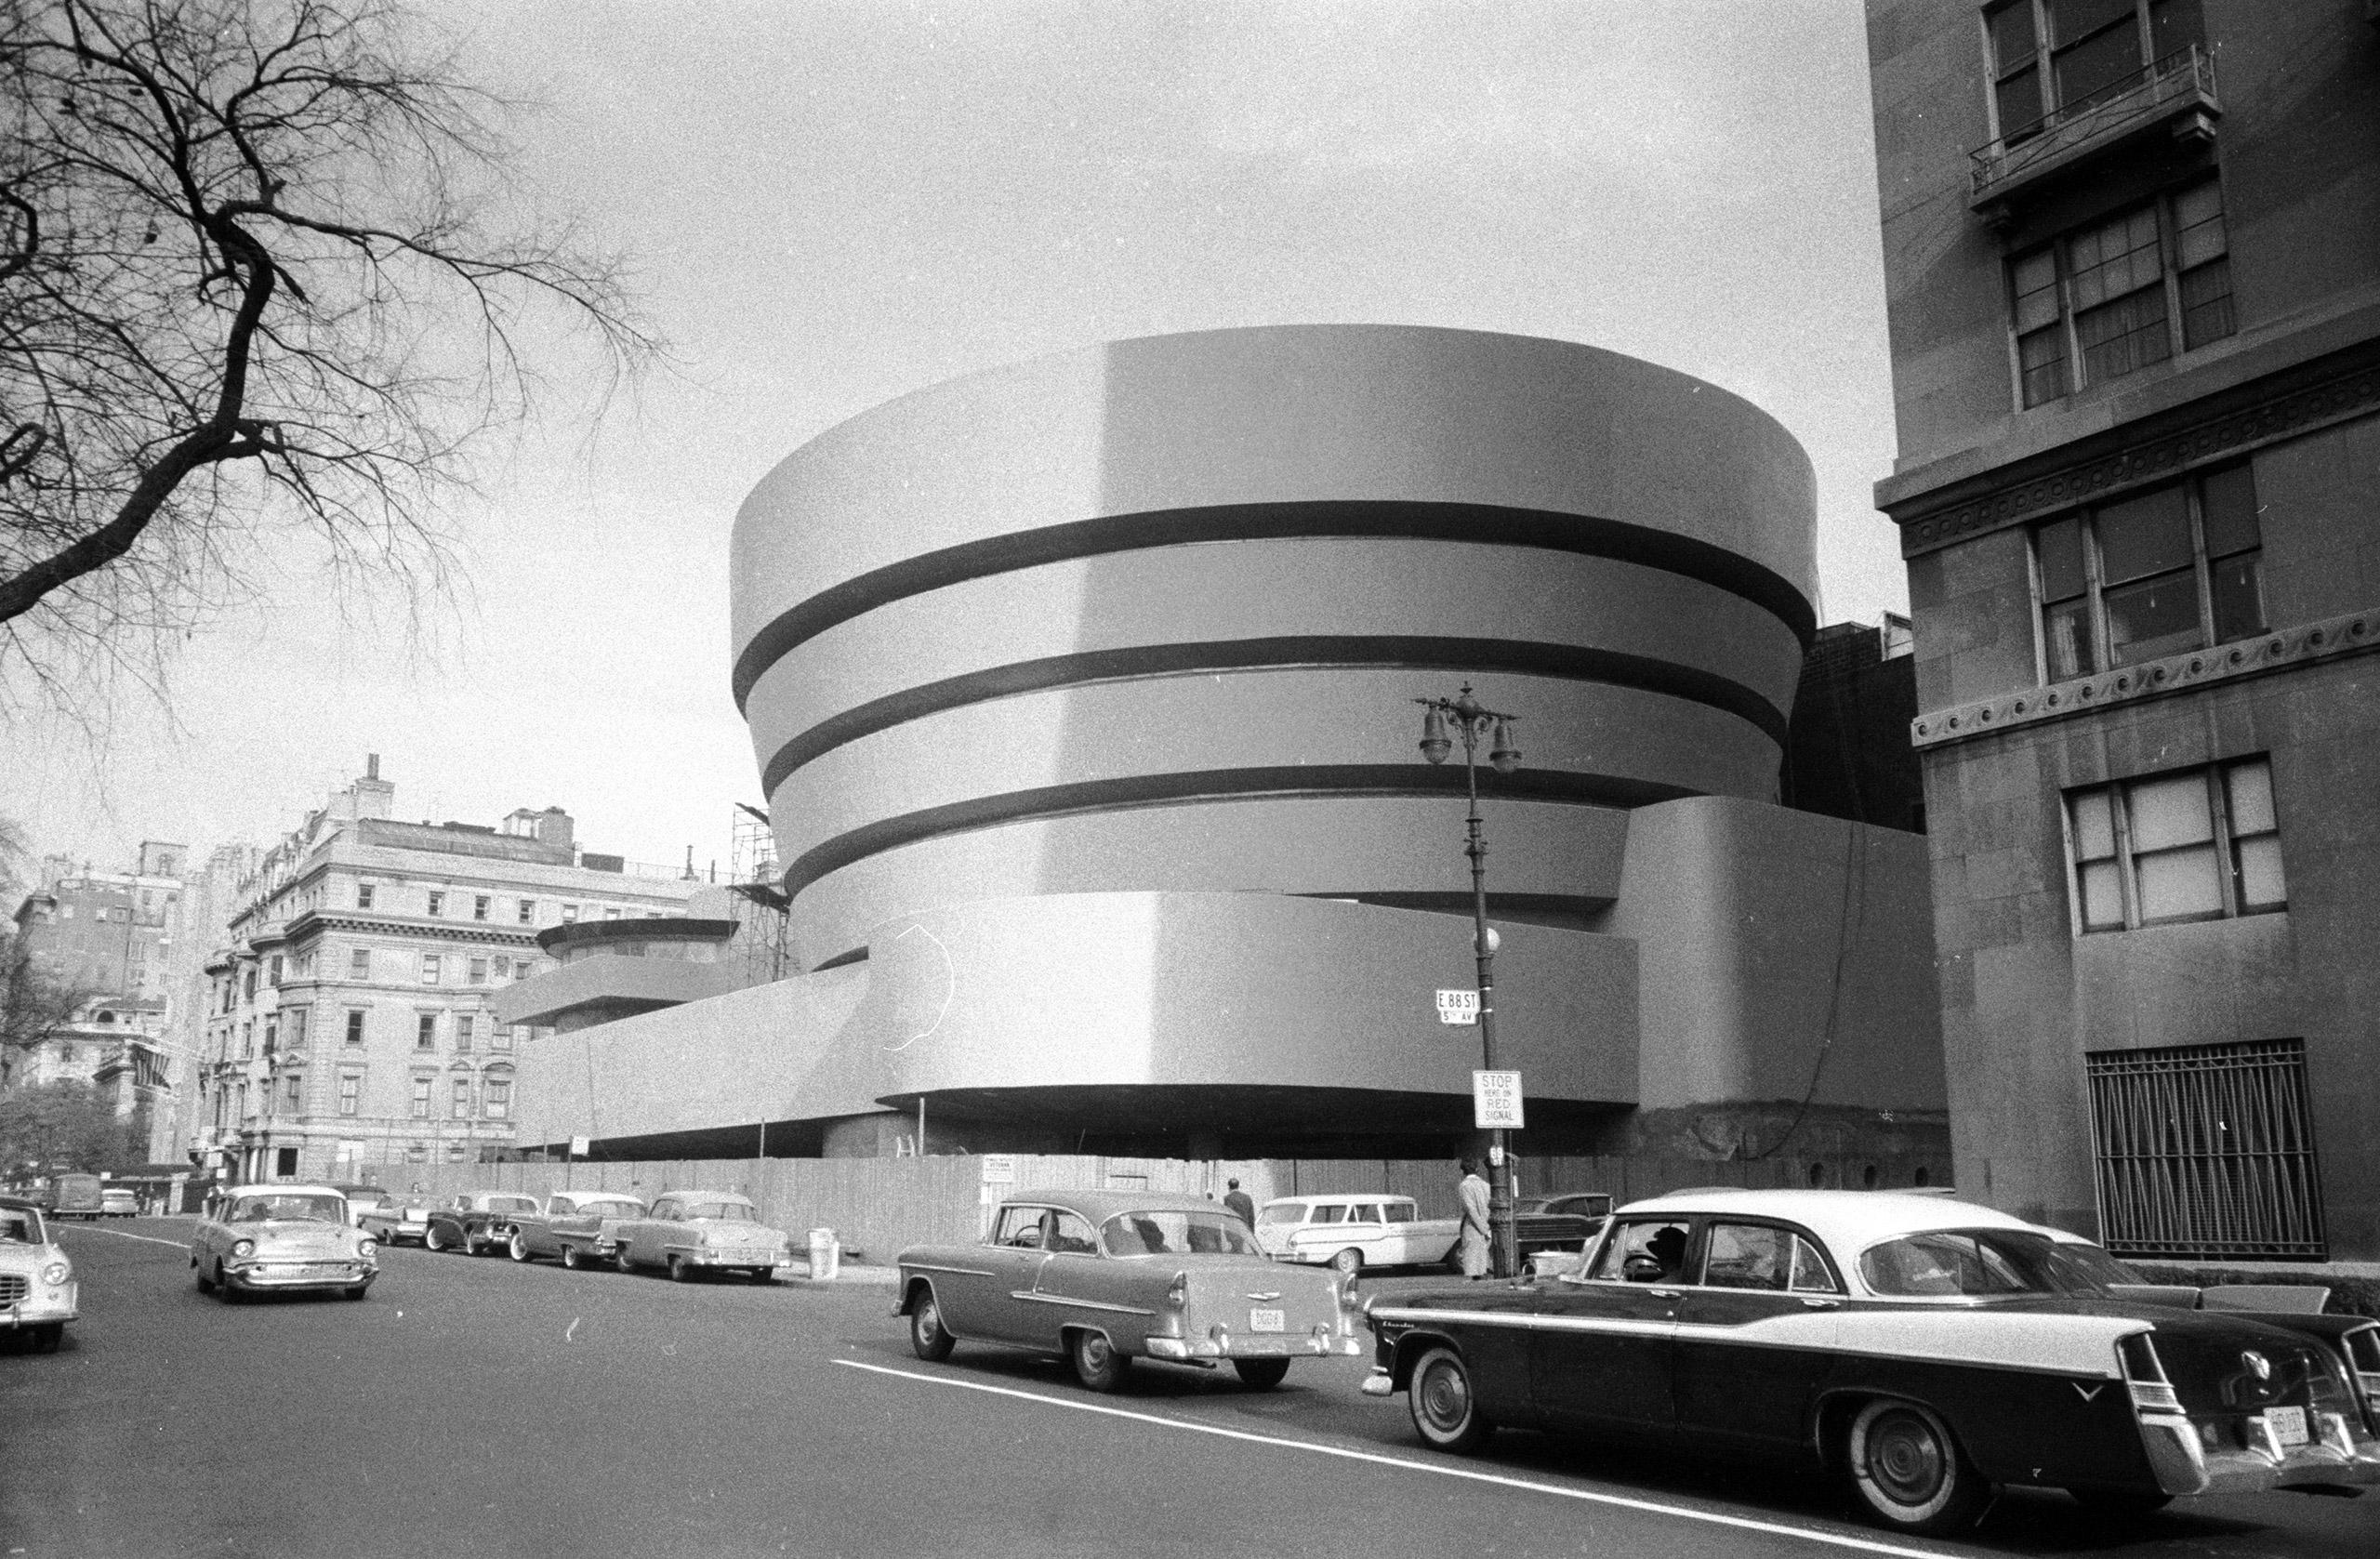 Frank Lloyd Wright's Guggenheim Museum in New York, N.Y. Built circa 1959.